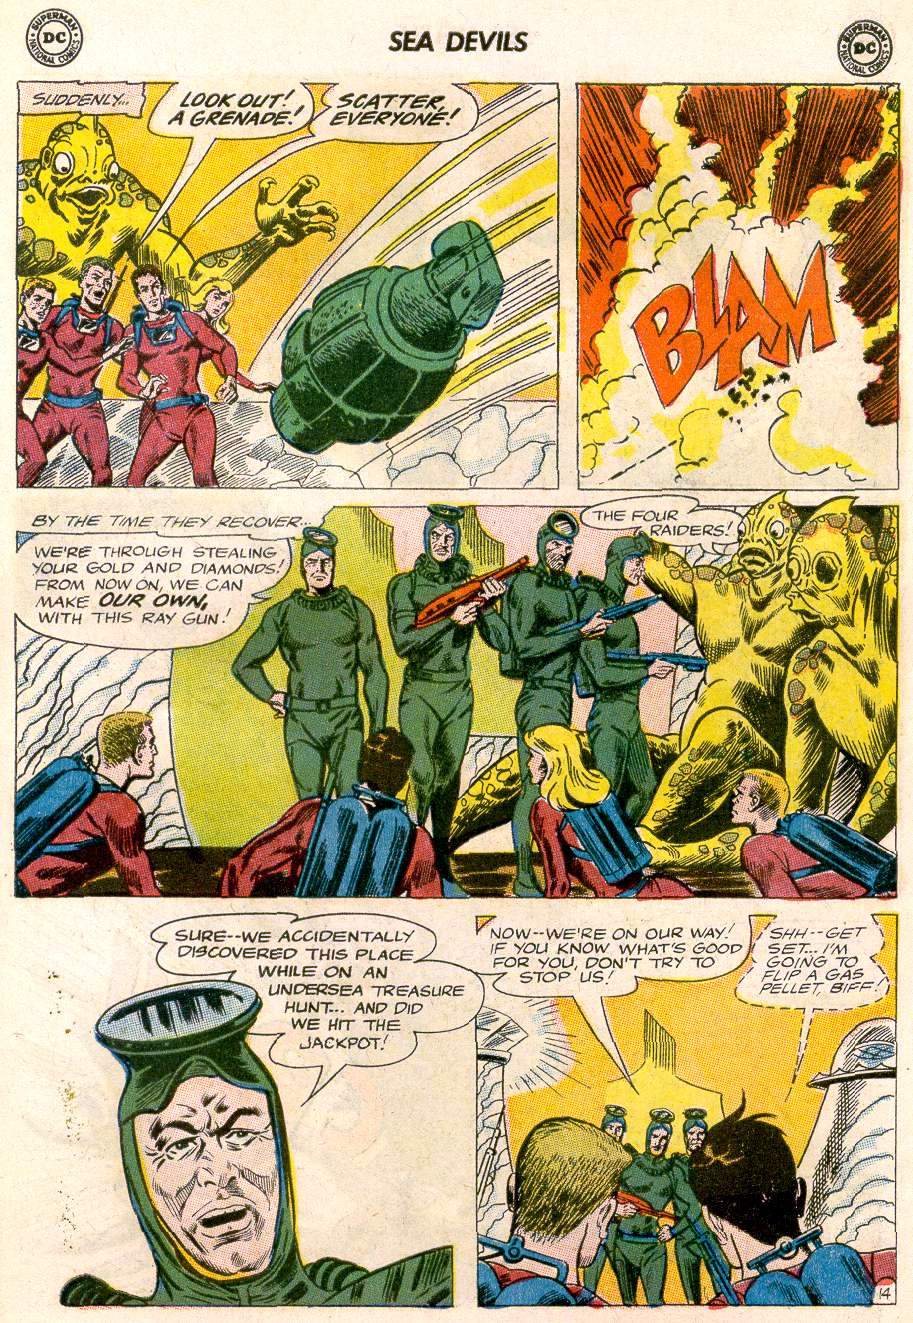 Read online Sea Devils comic -  Issue #20 - 19